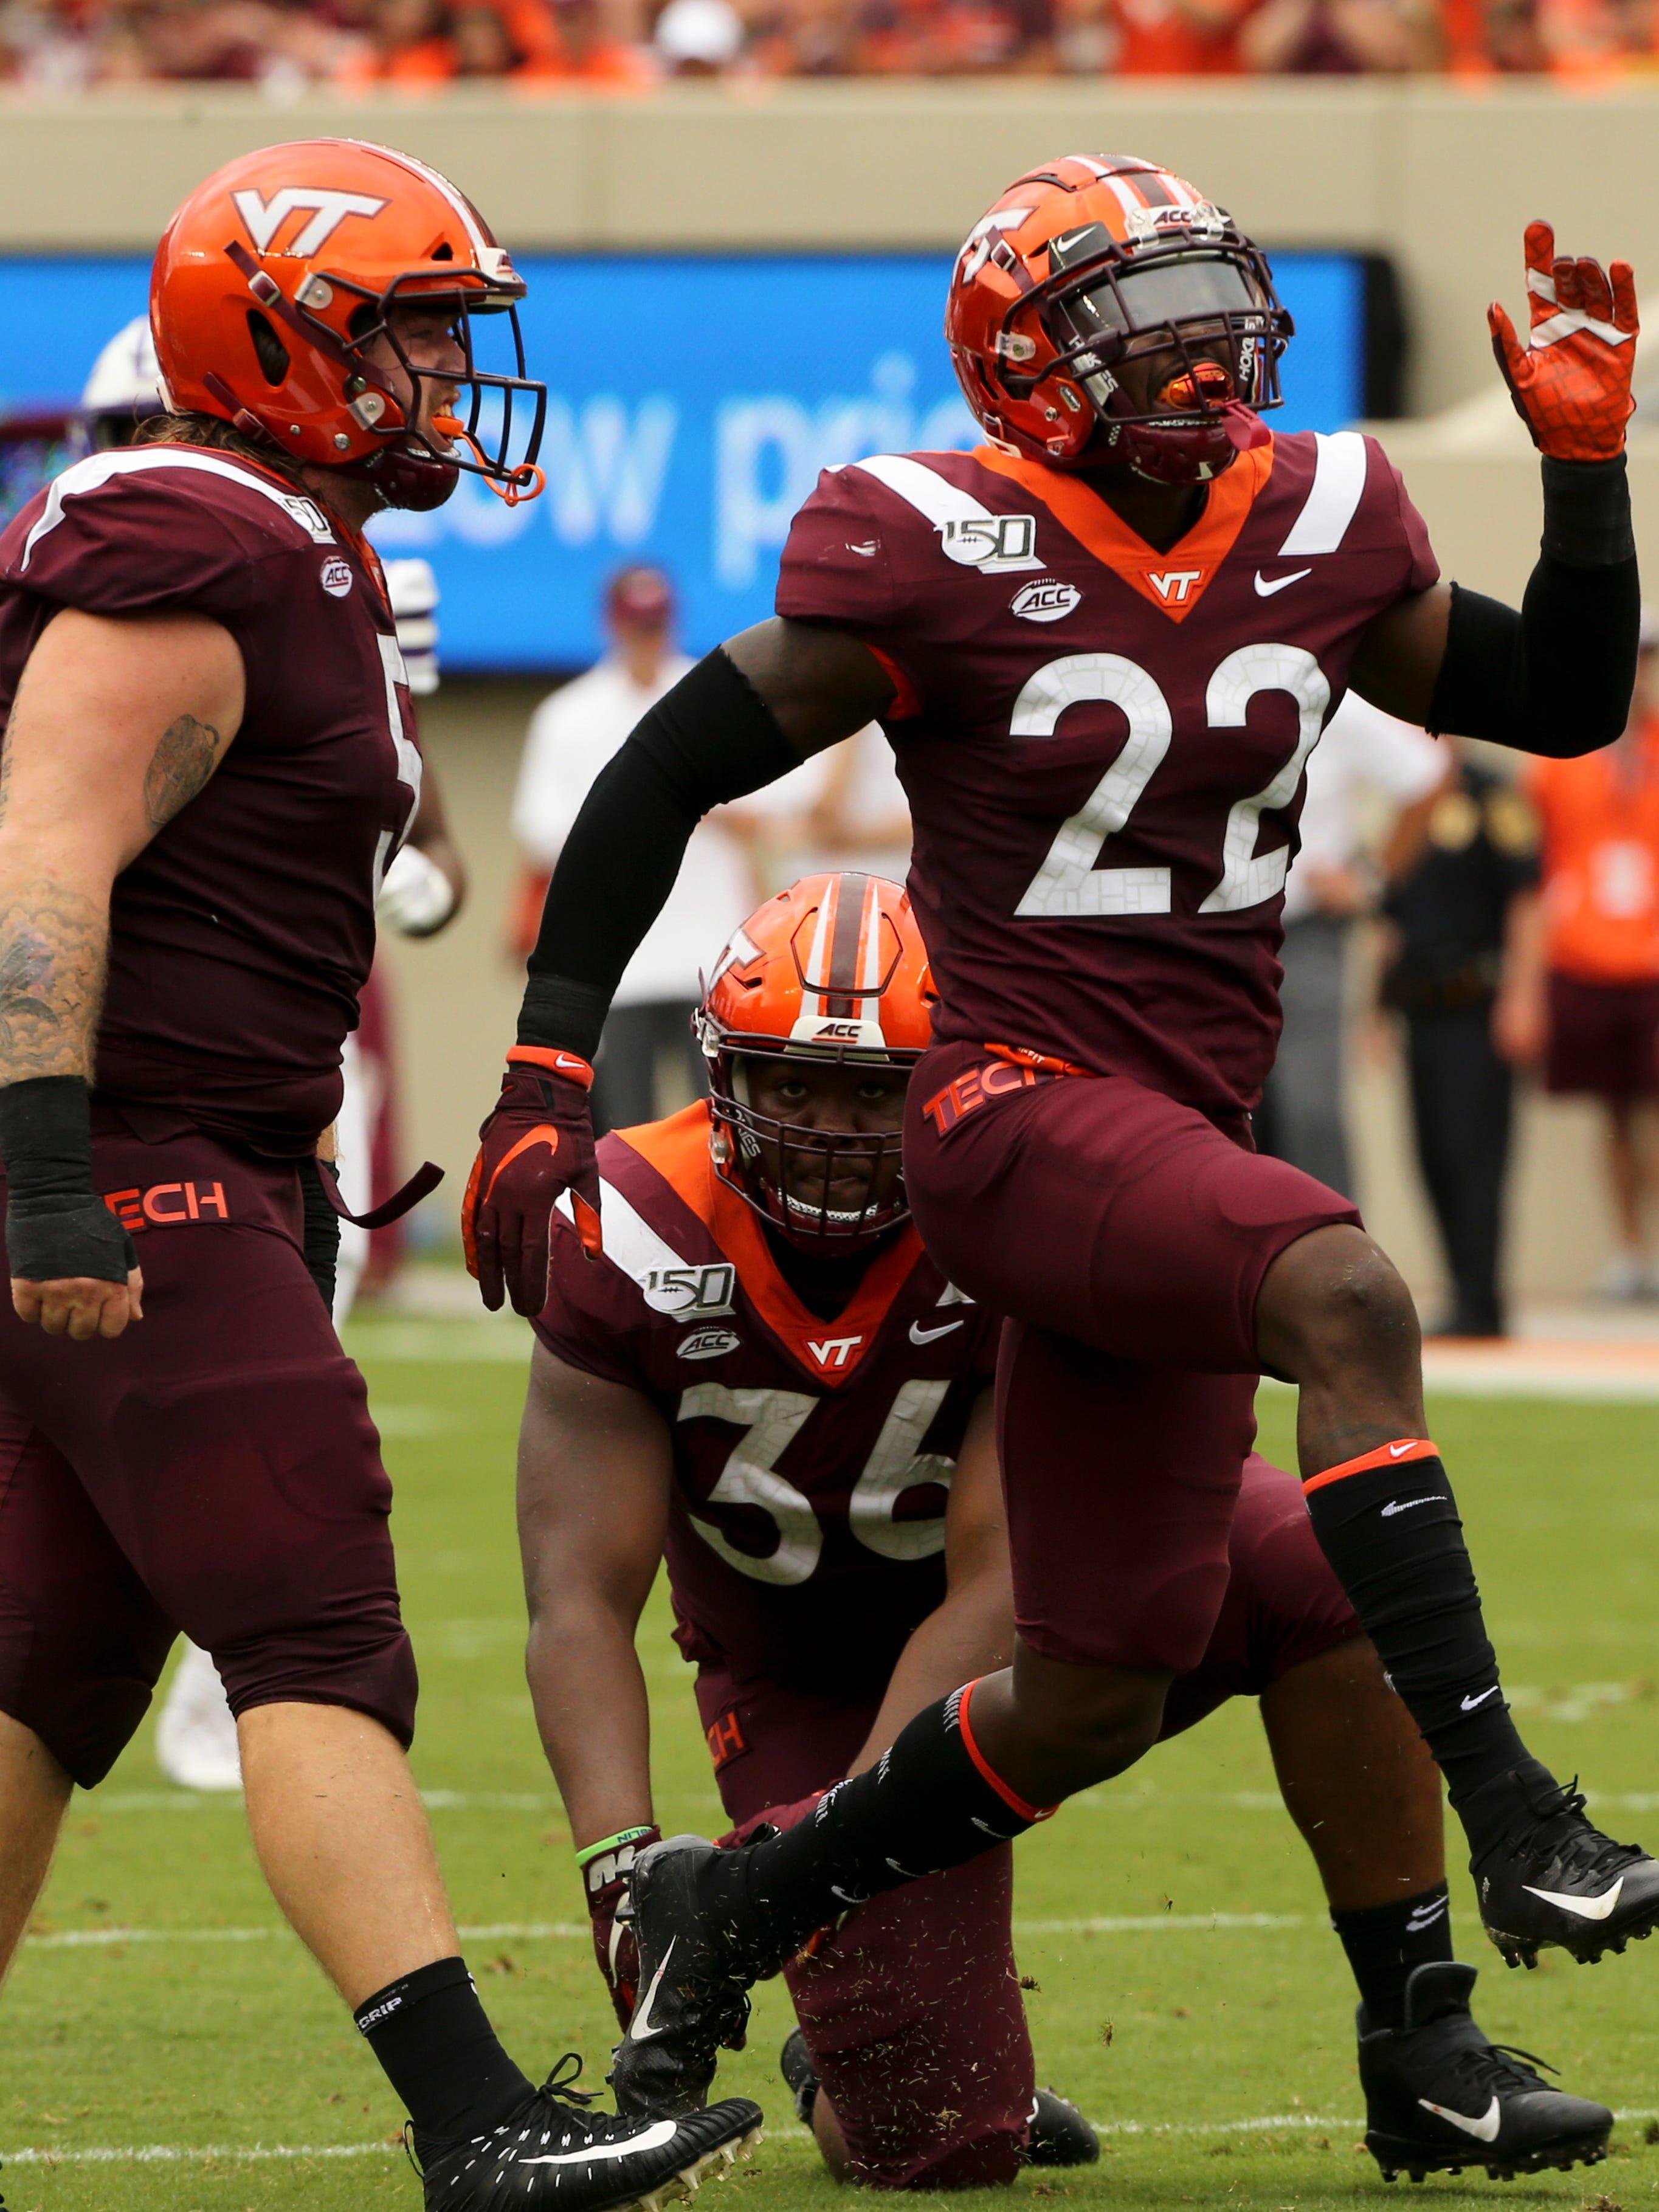 Virginia Tech Vs Duke Football How To Watch On Tv Stream Online